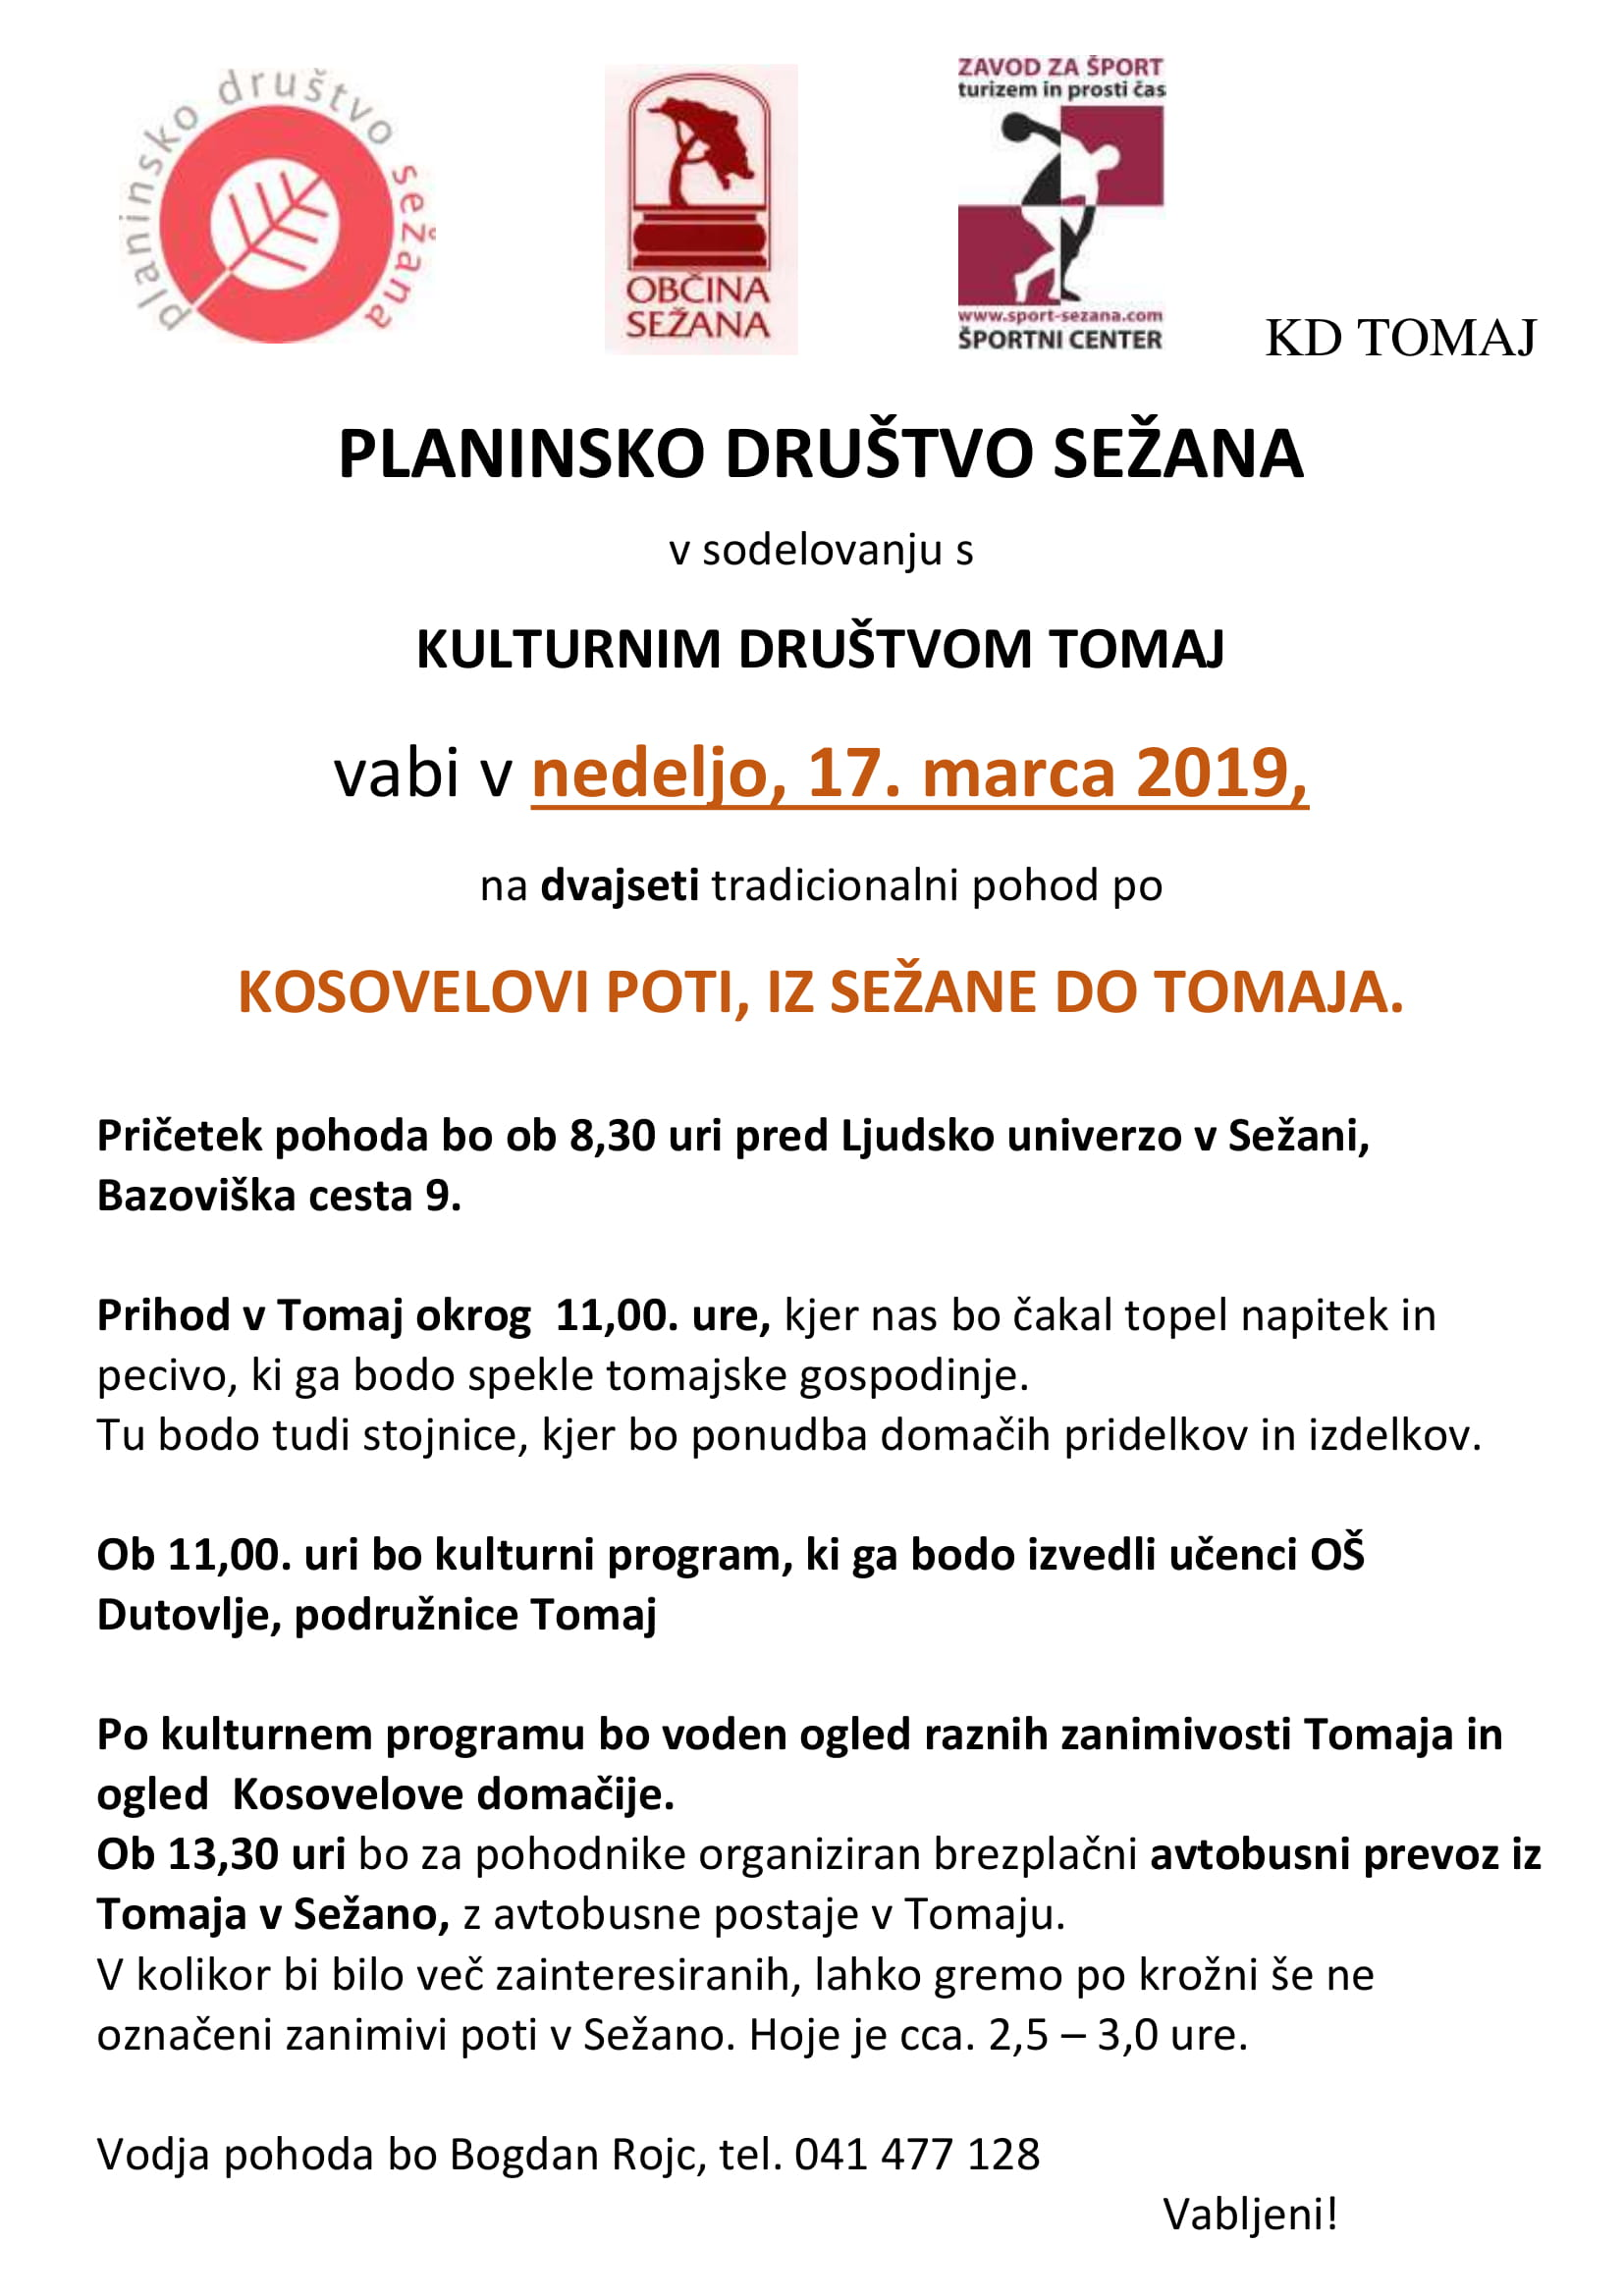 PD_pohod_po_Kosovelovi_p.____17._3.__2019_1